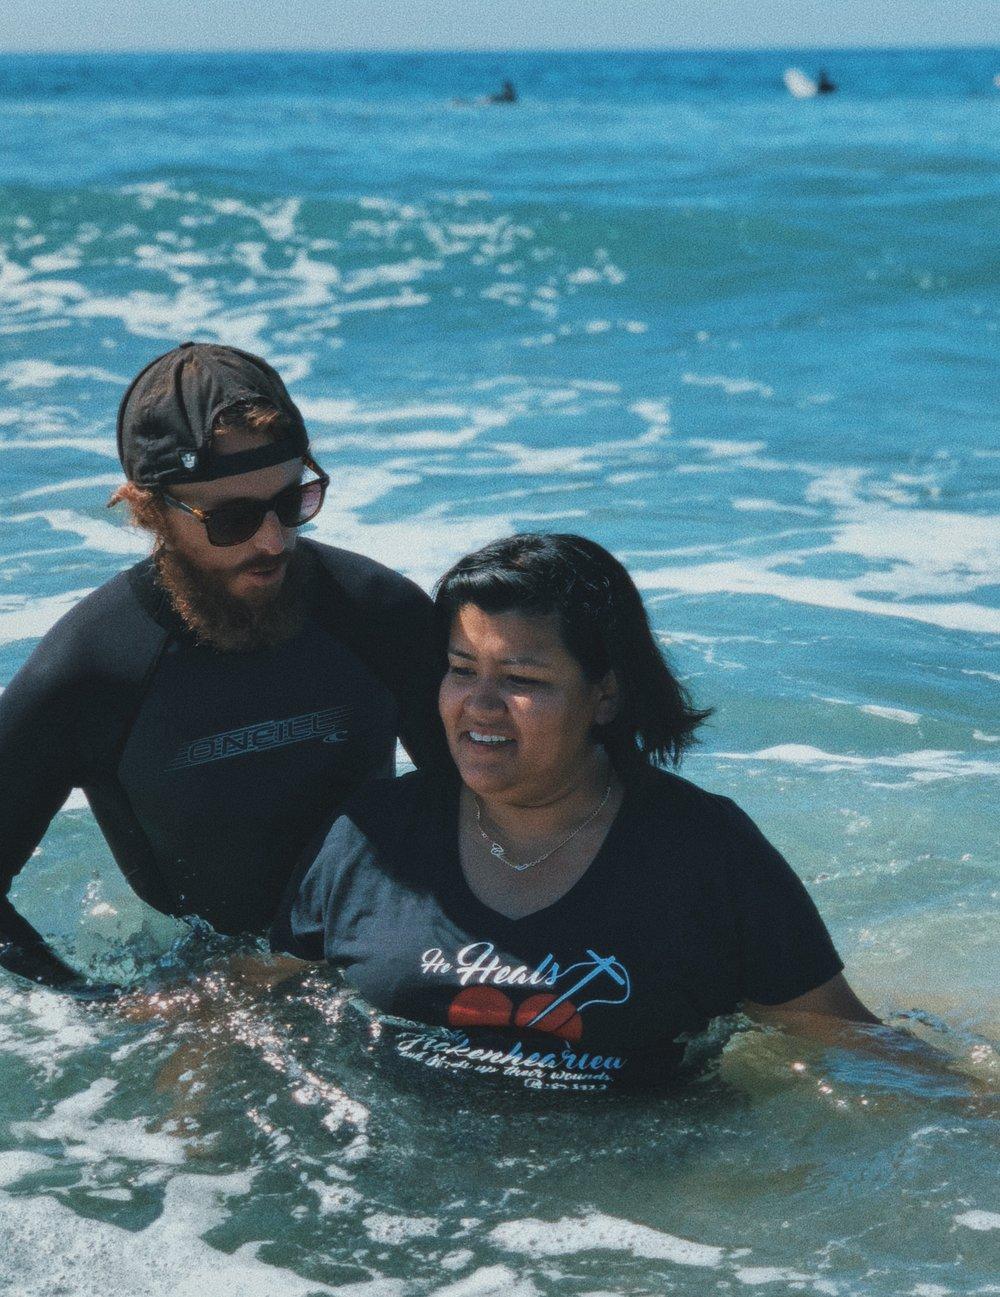 malibu-beach-baptism-mission-hills-christian-church-16.jpg